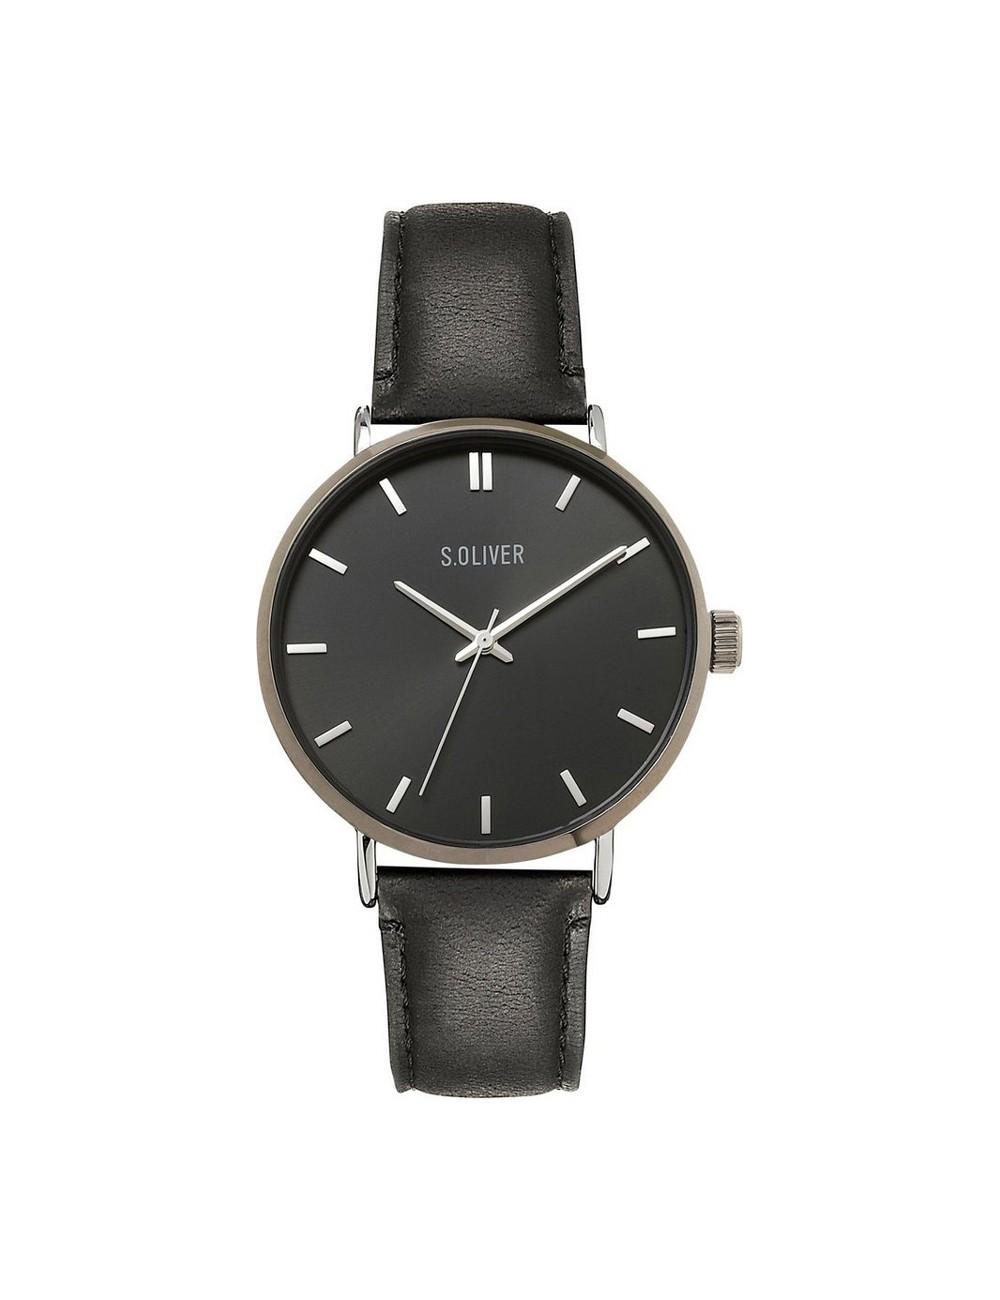 s.Oliver SO-4229-LQ Mens Watch